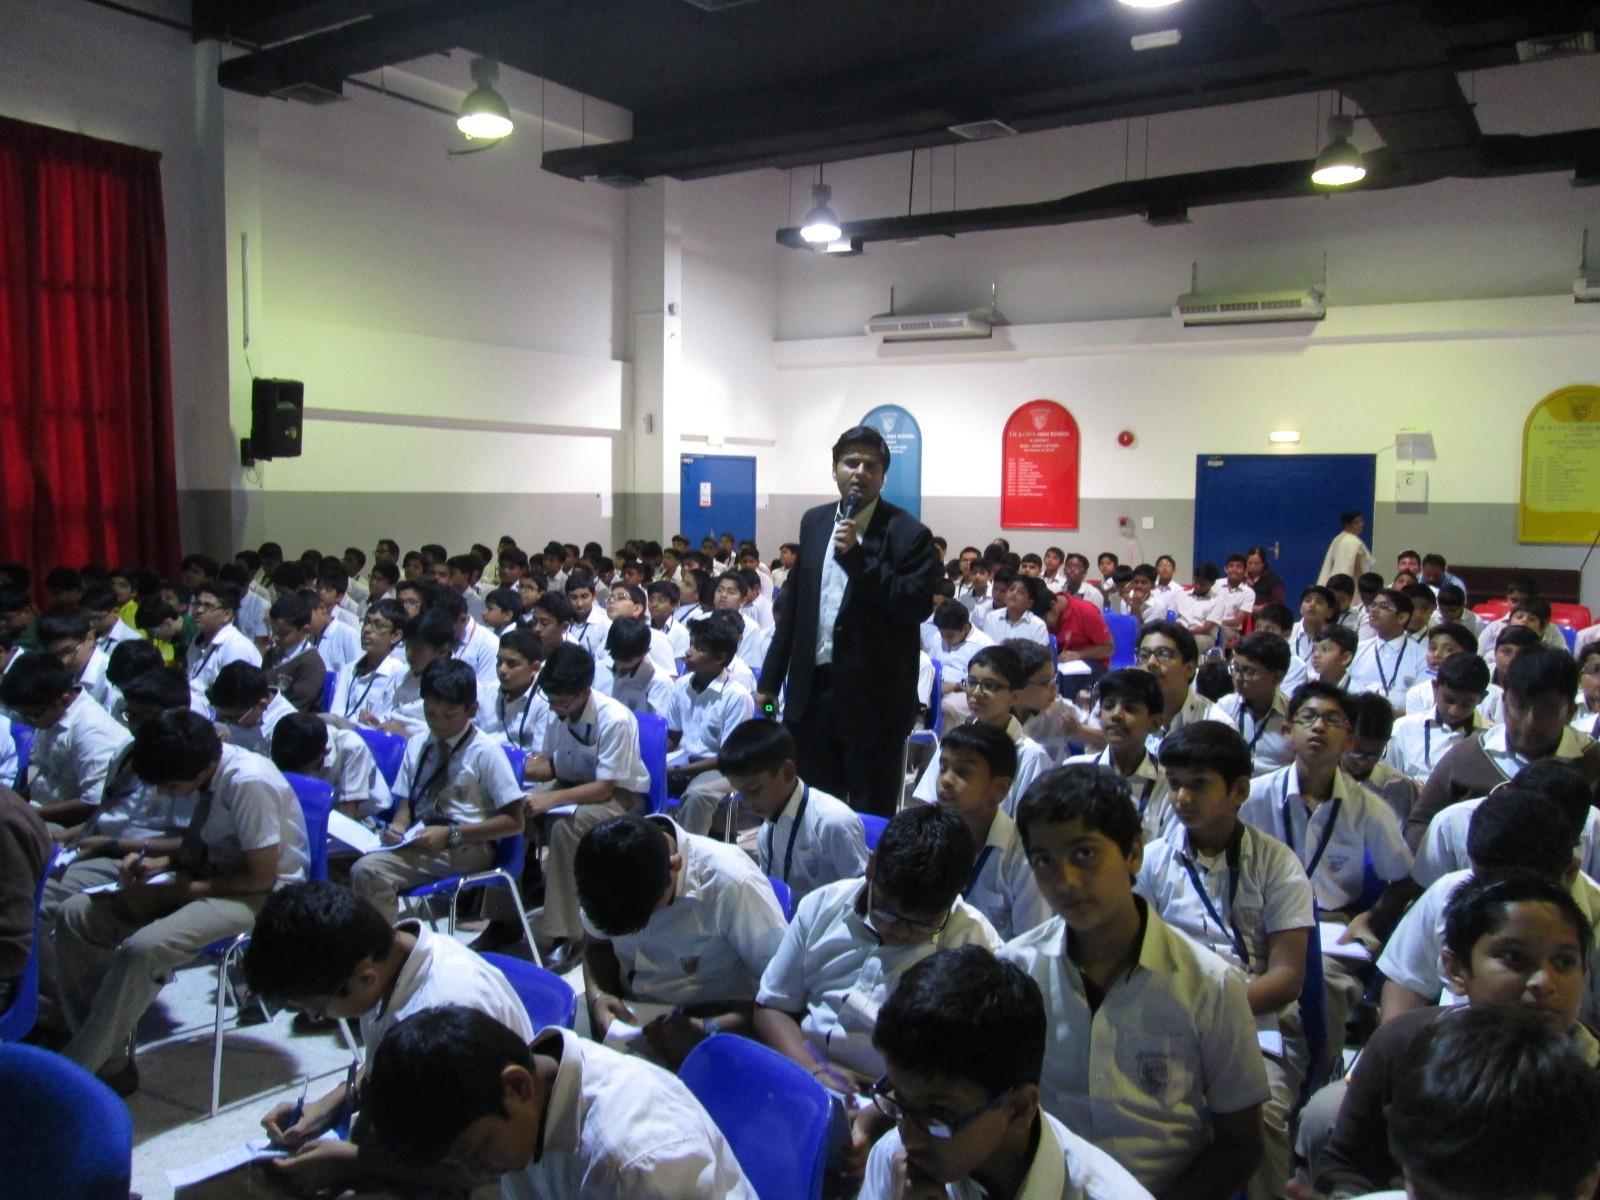 Offering workshops in English, Hindi, Gujarati, Marathi and Urdu Languages